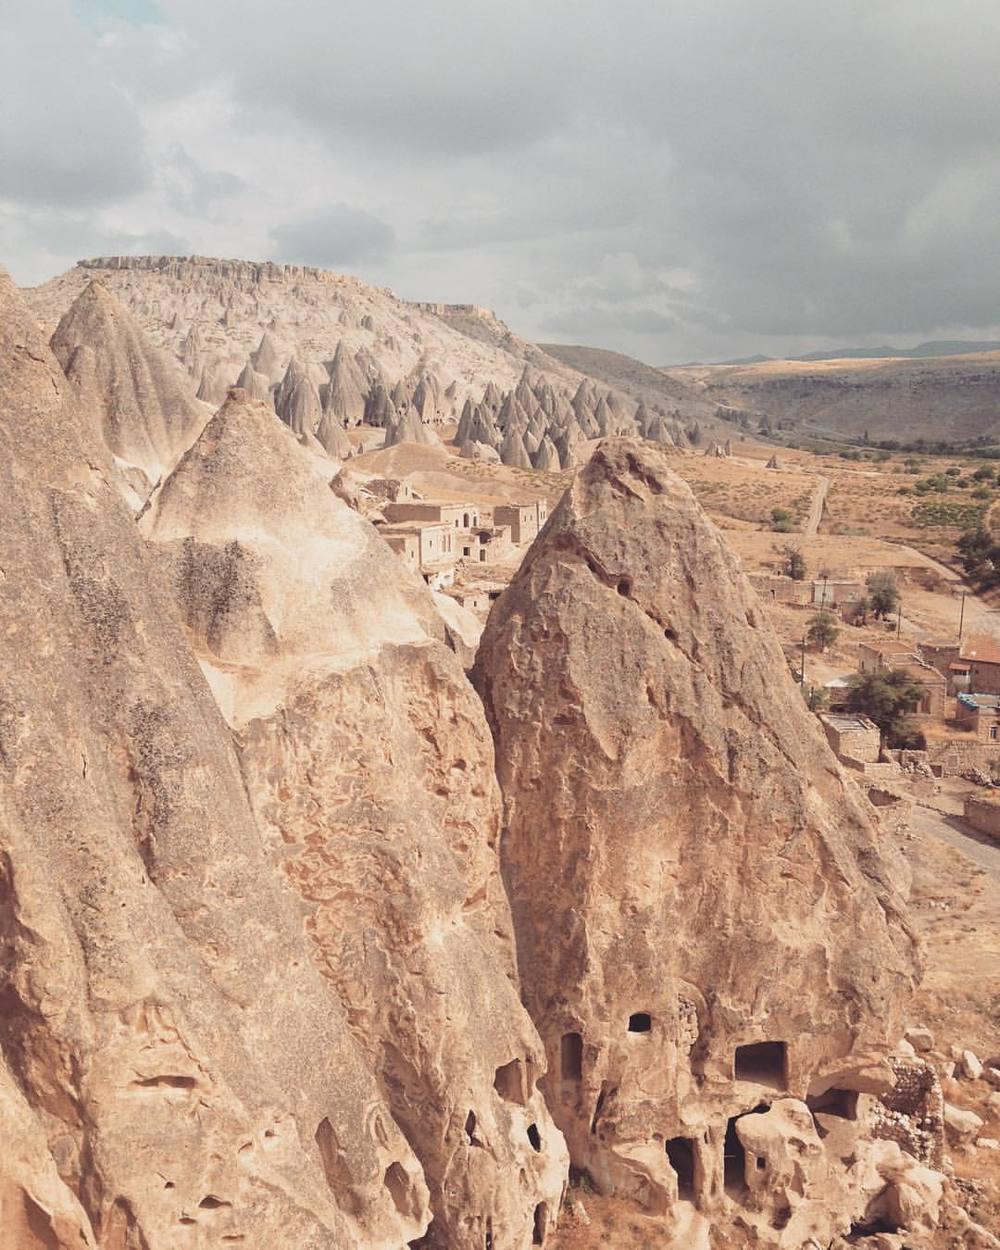 #Cappadoccia #Turkey is insane 🙆🏼 #🇹🇷  (at Göreme National Park)